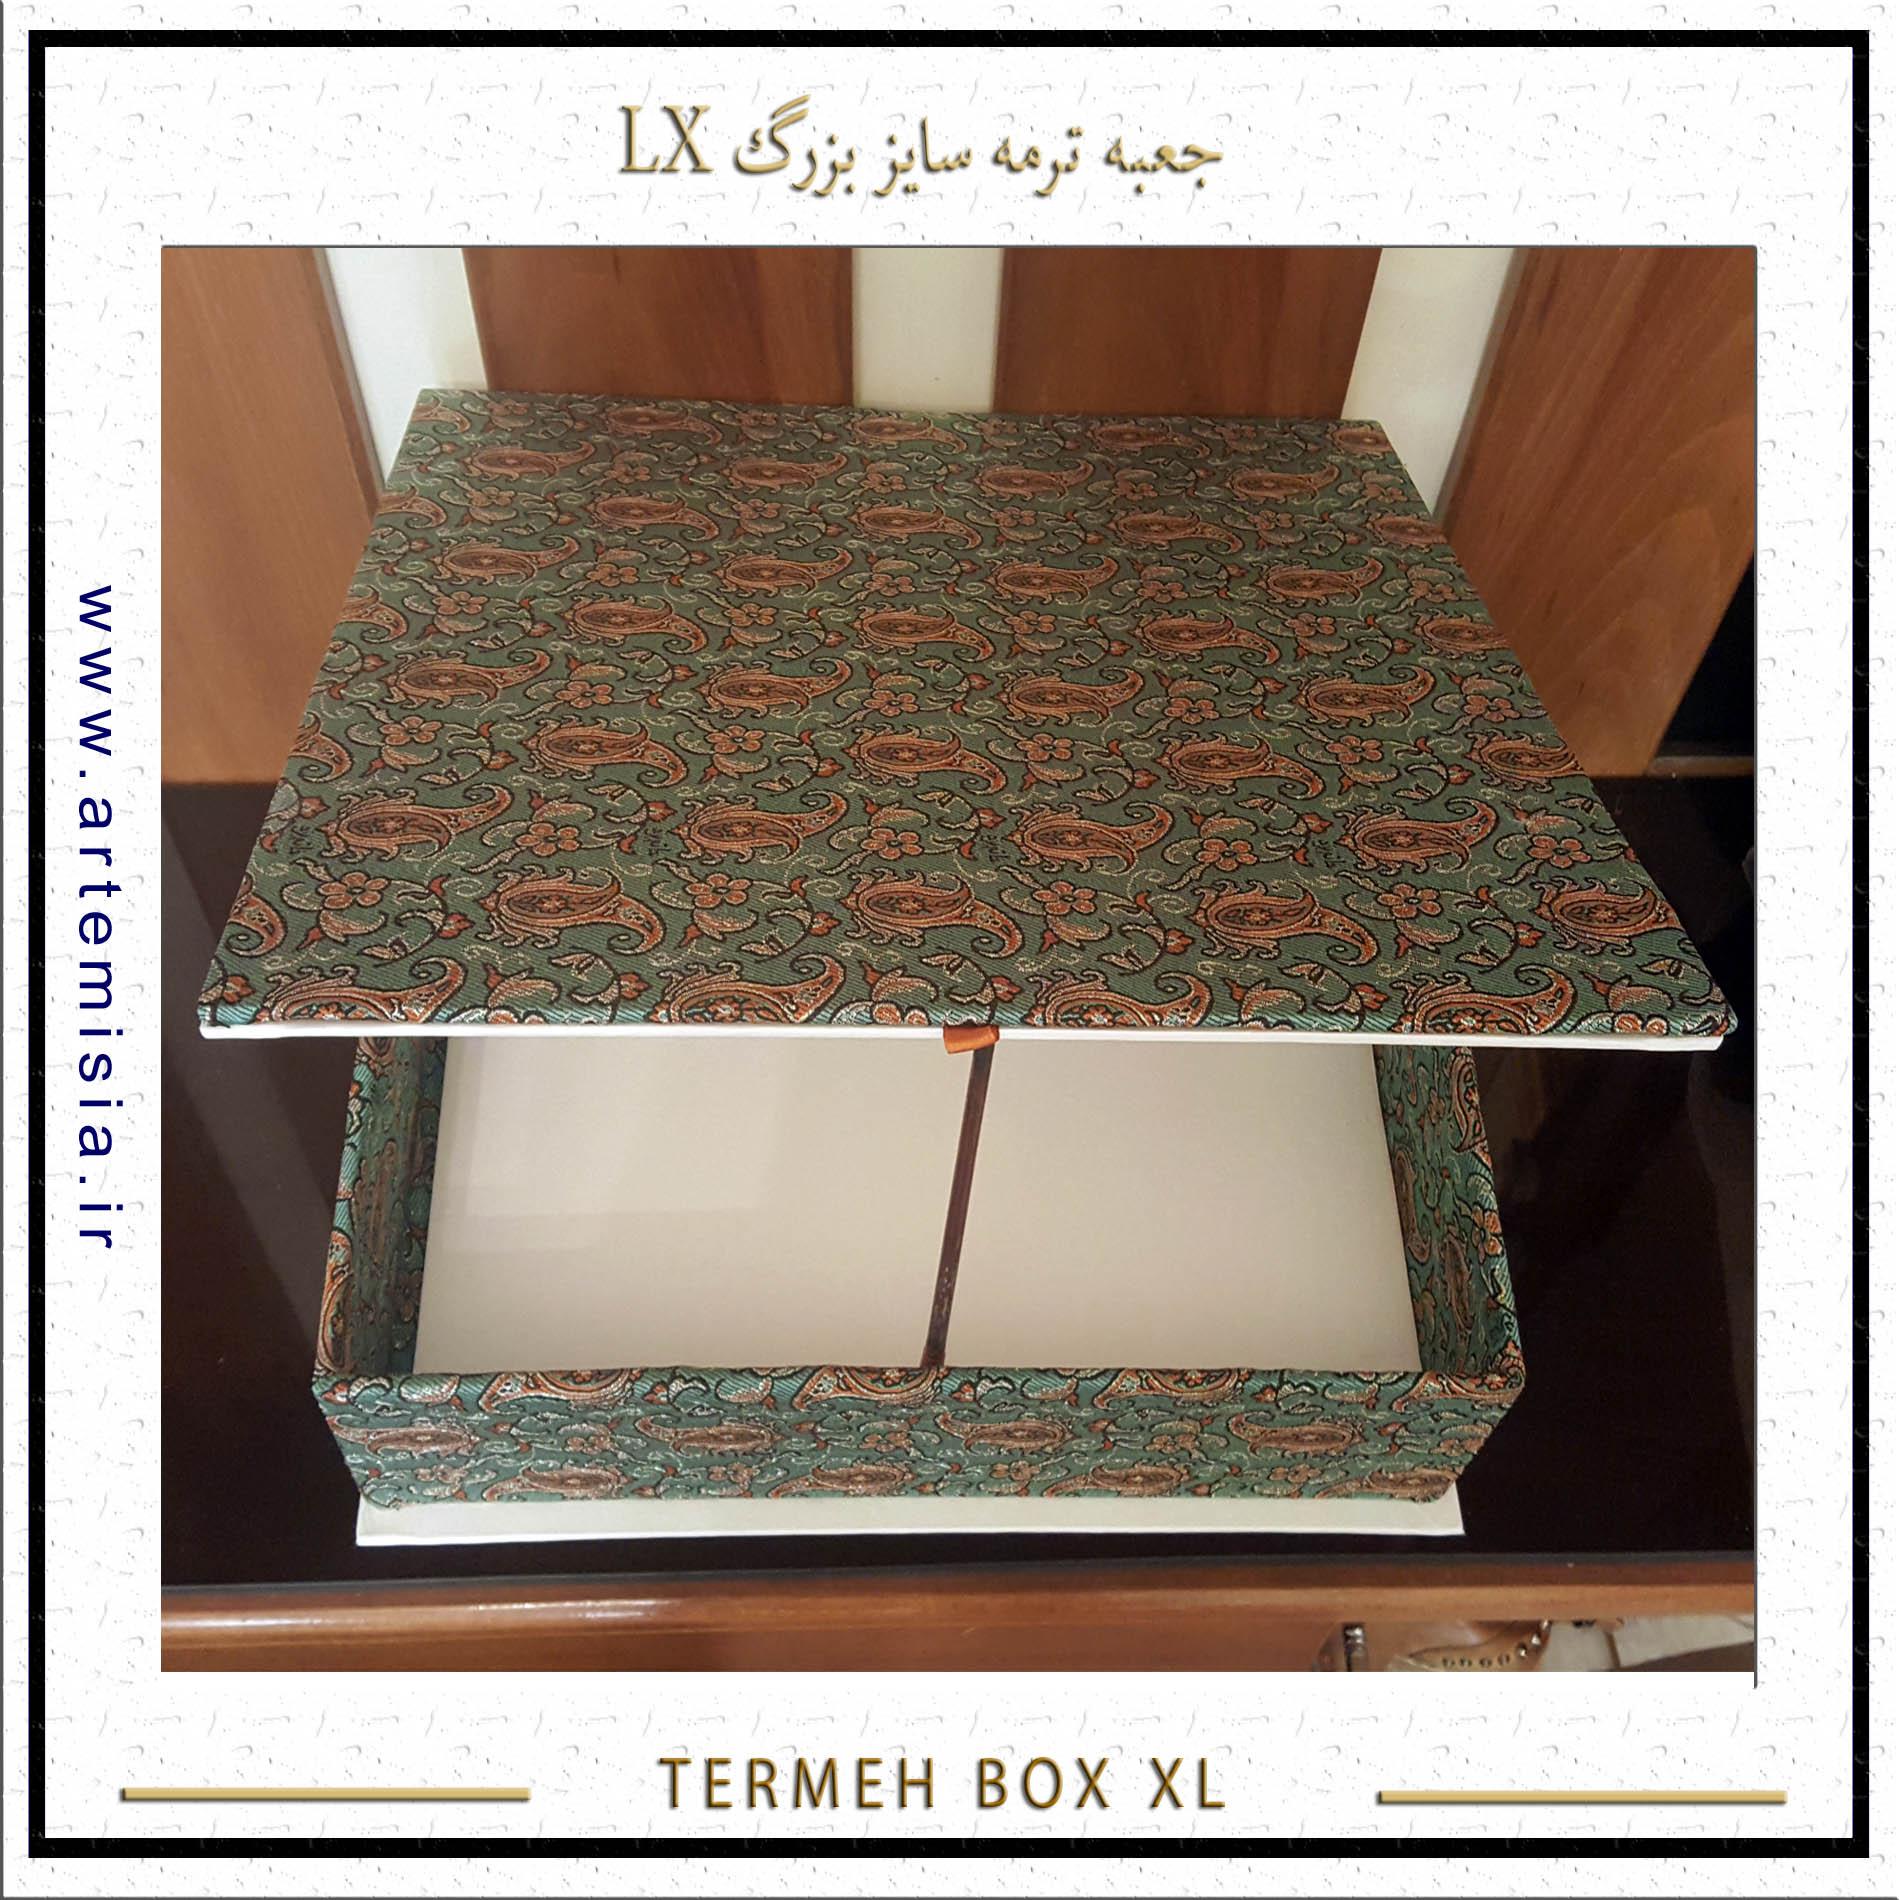 Termeh Box XL